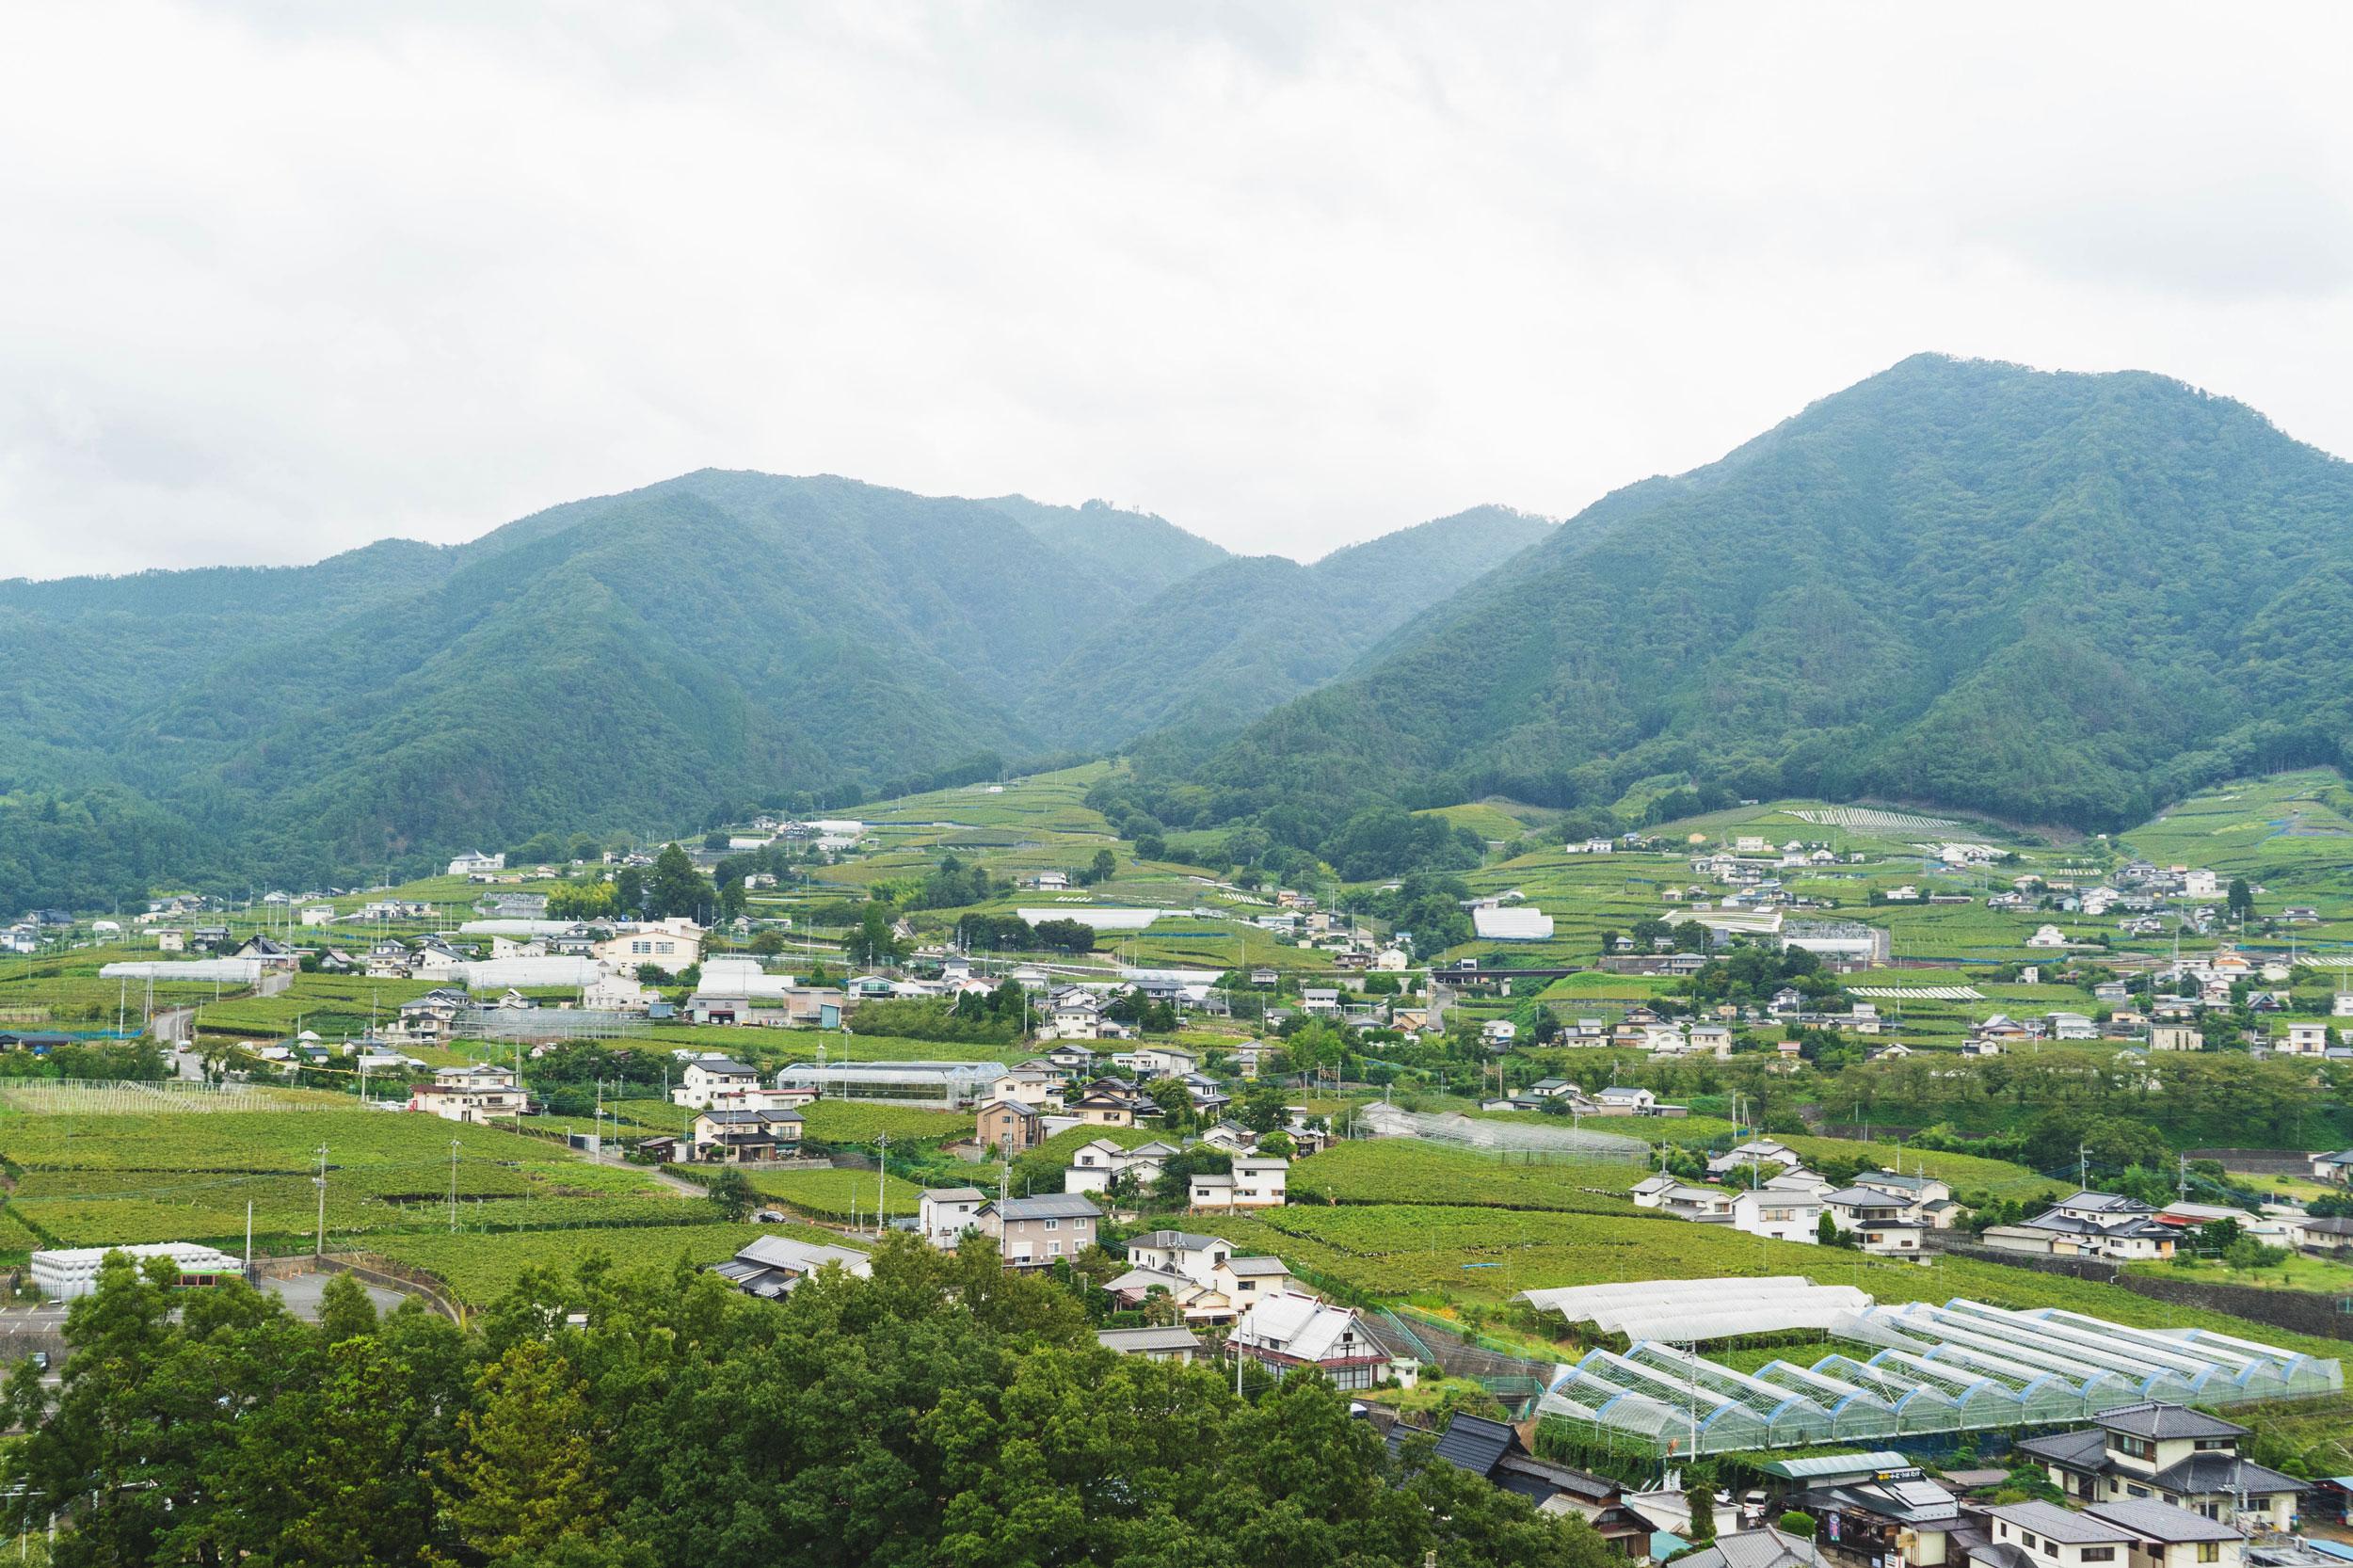 Koshu city in Yamanashi, Japan